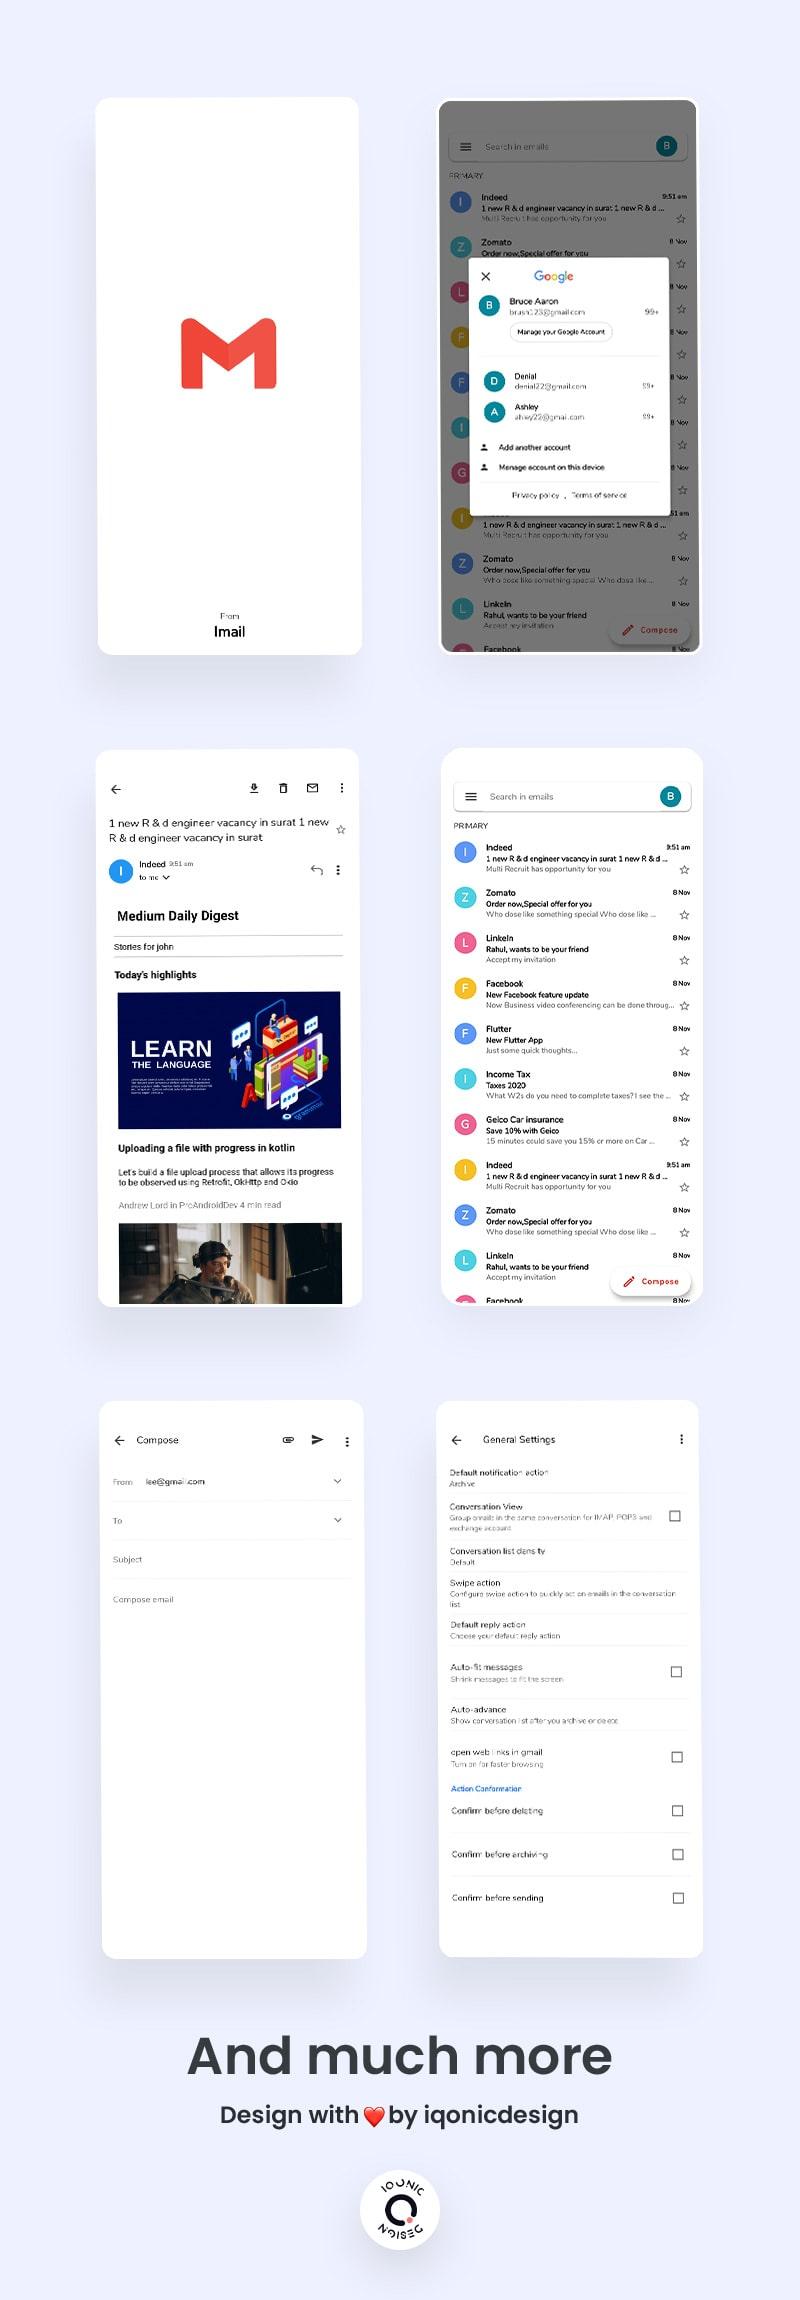 Free Google Play Store Clone Flutter UI Kit   AppMarket   Iqonic Design free google play store clone flutter ui kit AppMarket Flutter 05 list imail min min